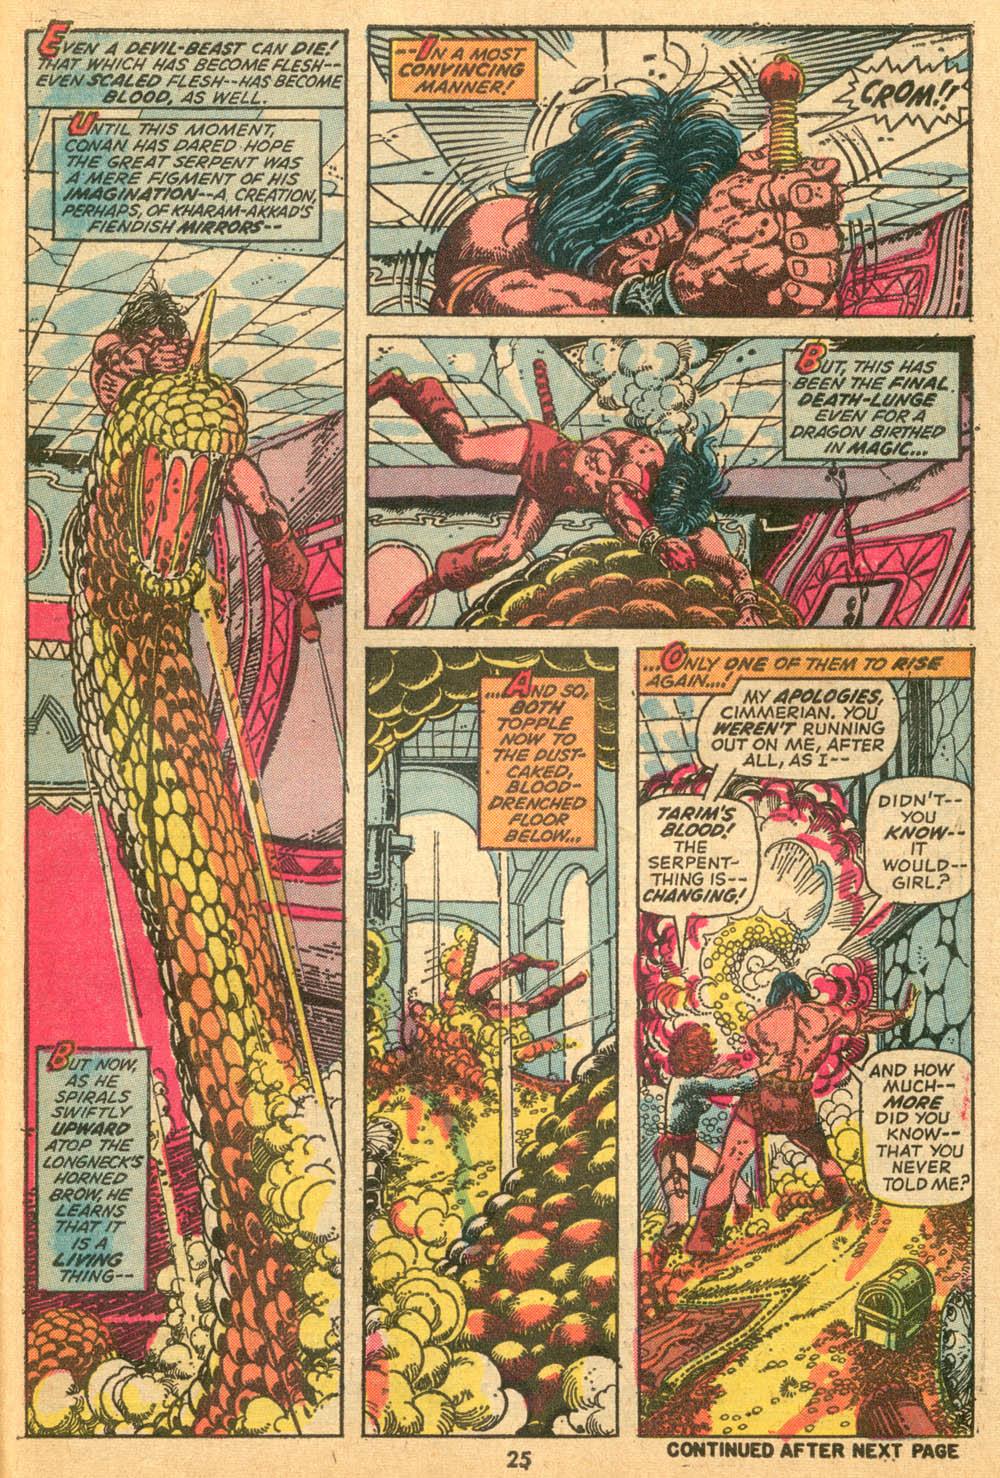 In 'Conan The Barbarian' (1973) #24, Conan pierces the Devil-Beast's head with his sword, killing it.